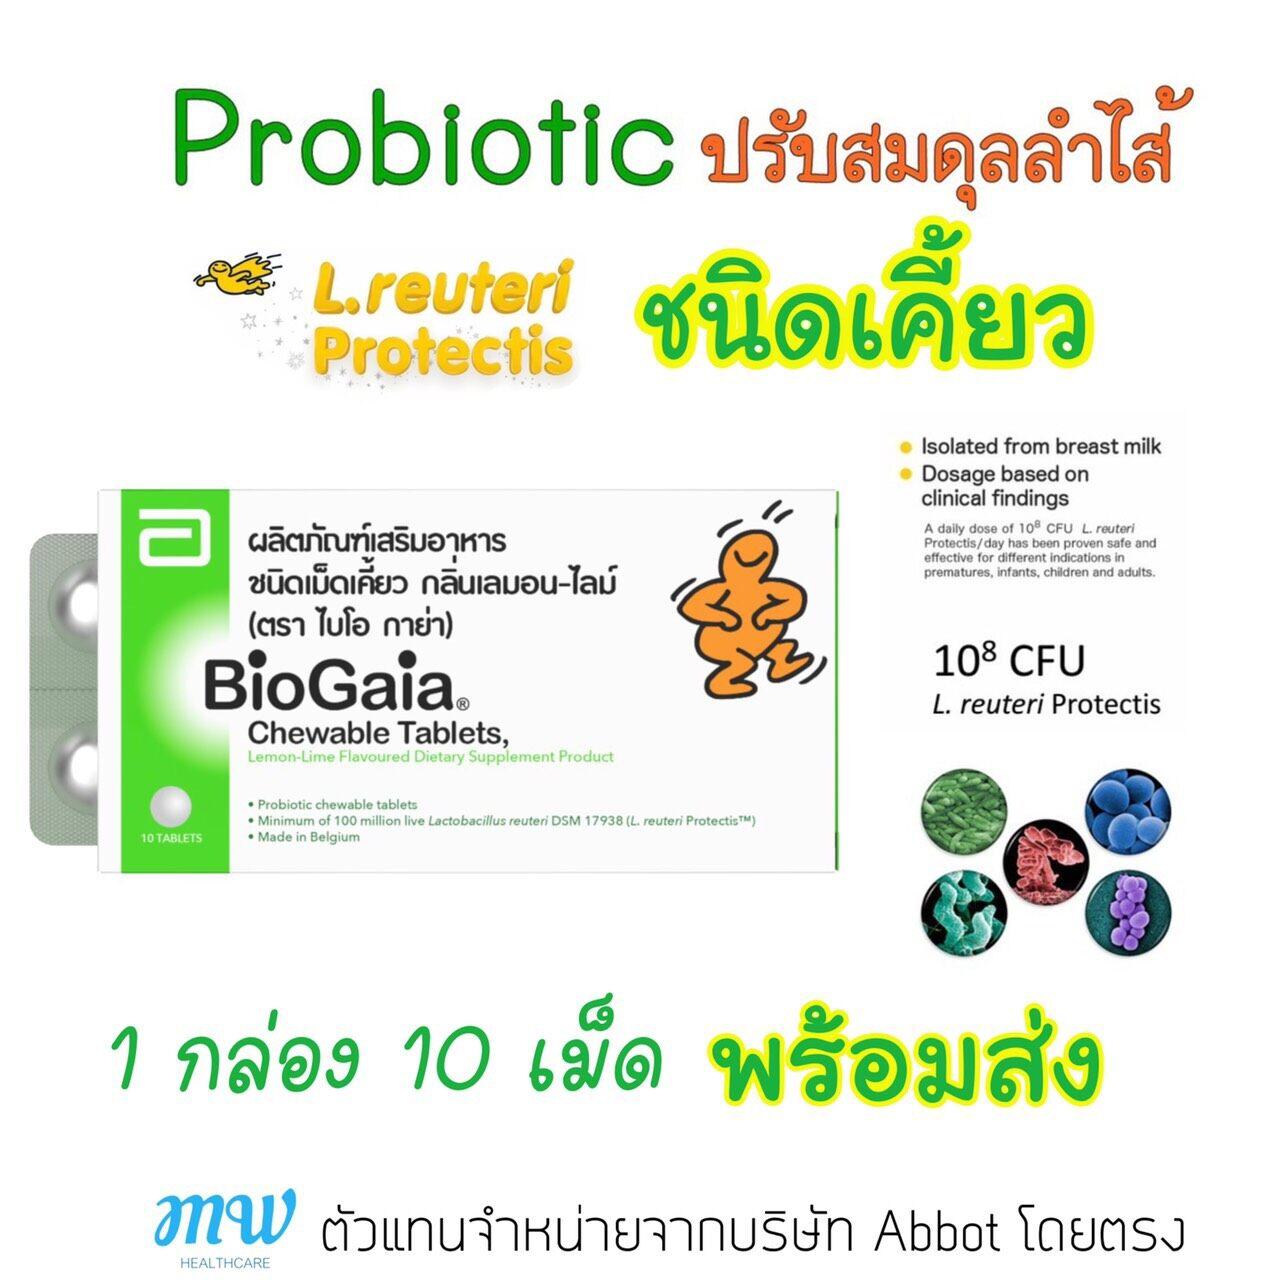 BioGaia Chewable Tablets Probiotic 1 กล่องมี 10 เม็ด